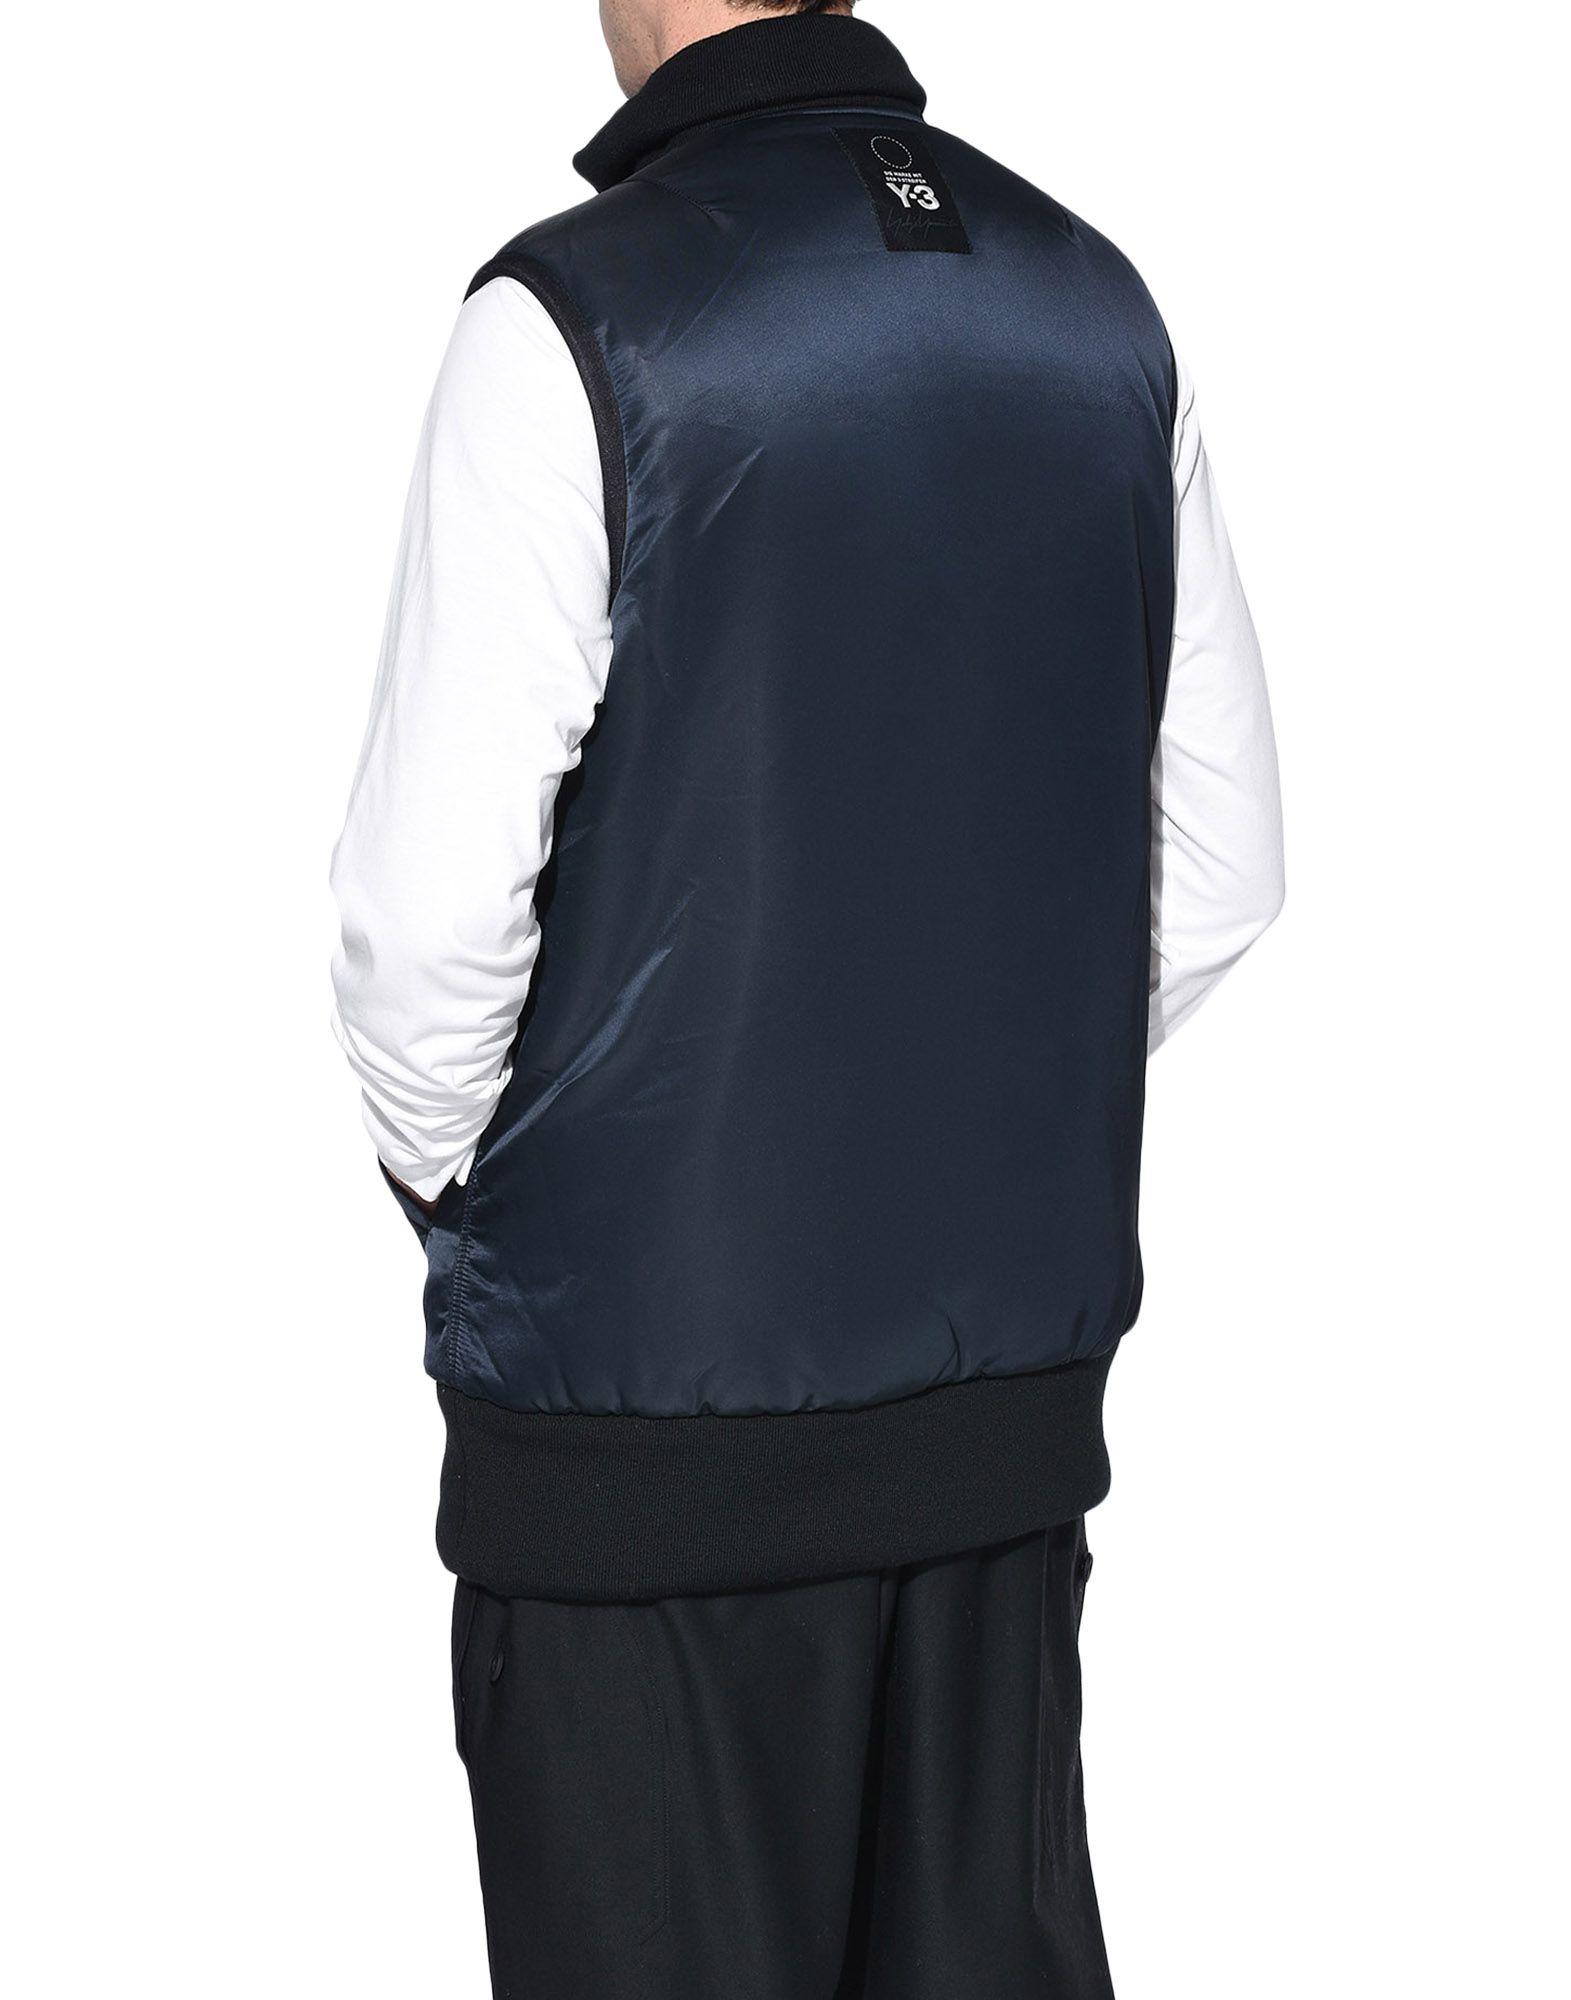 Y-3 Y-3 Oversize Reversible Vest ベスト メンズ e